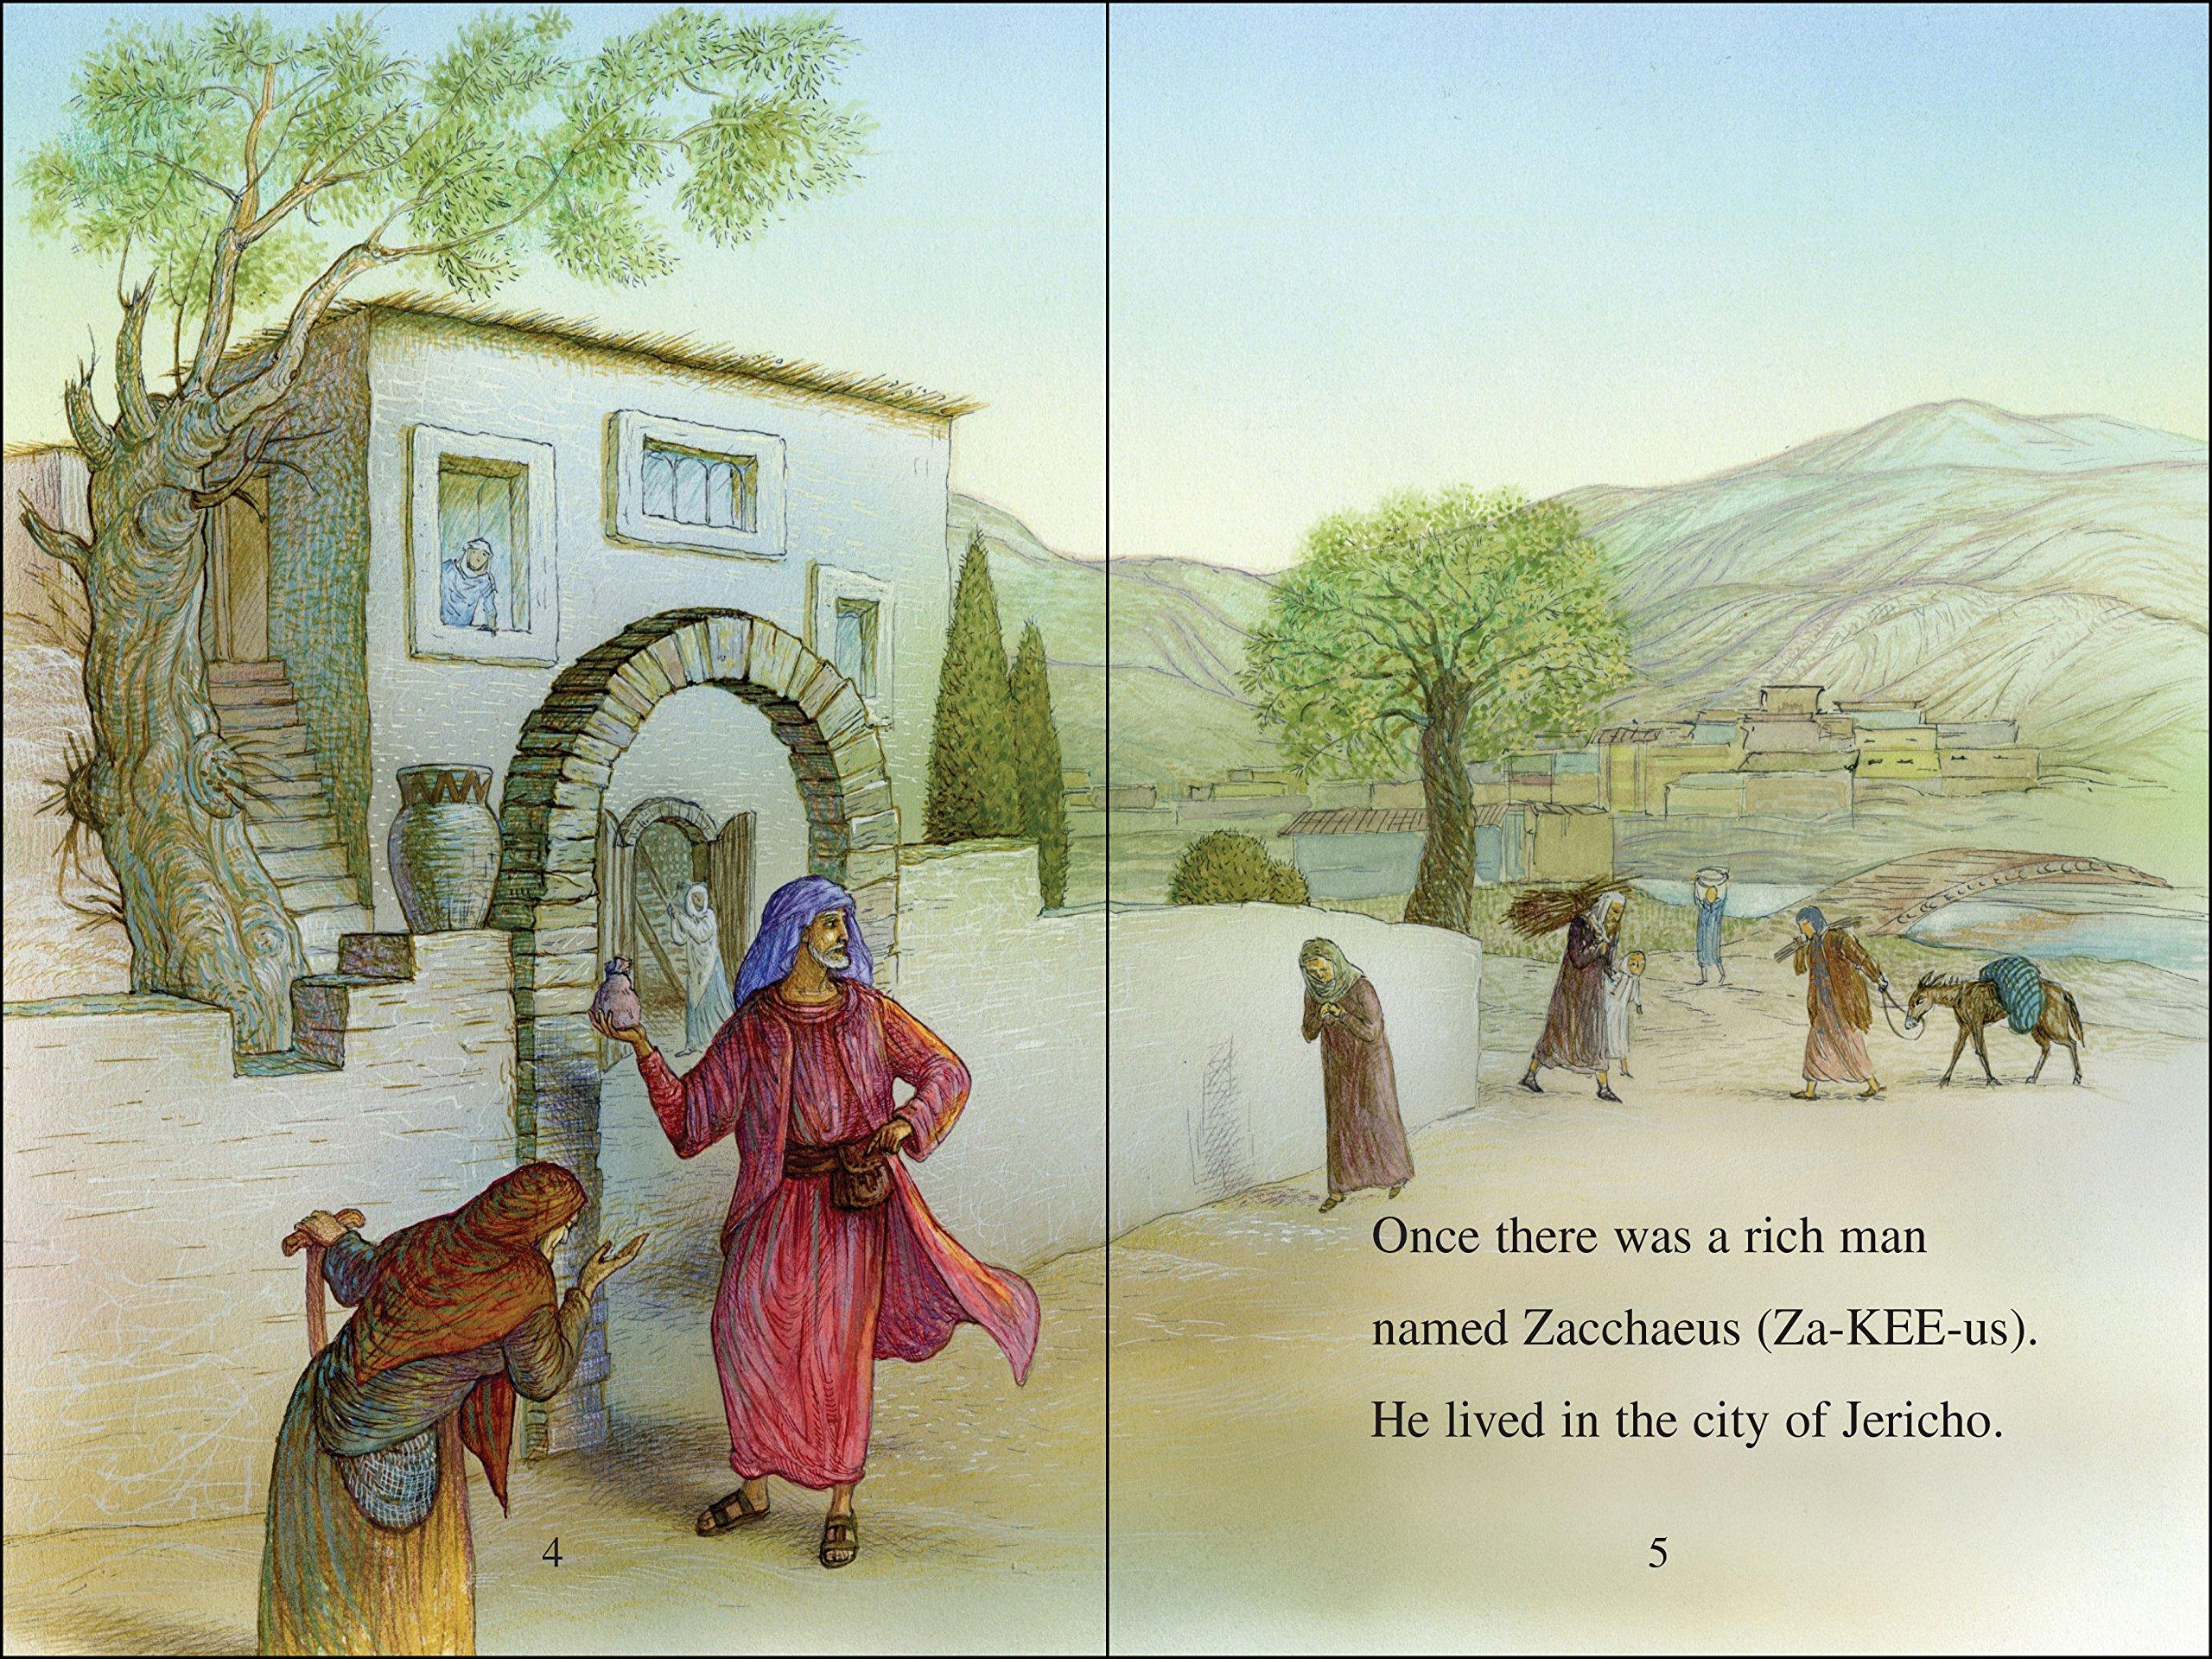 Amazon.com: Zacchaeus Meets Jesus (I Can Read!/Bible Stories ...